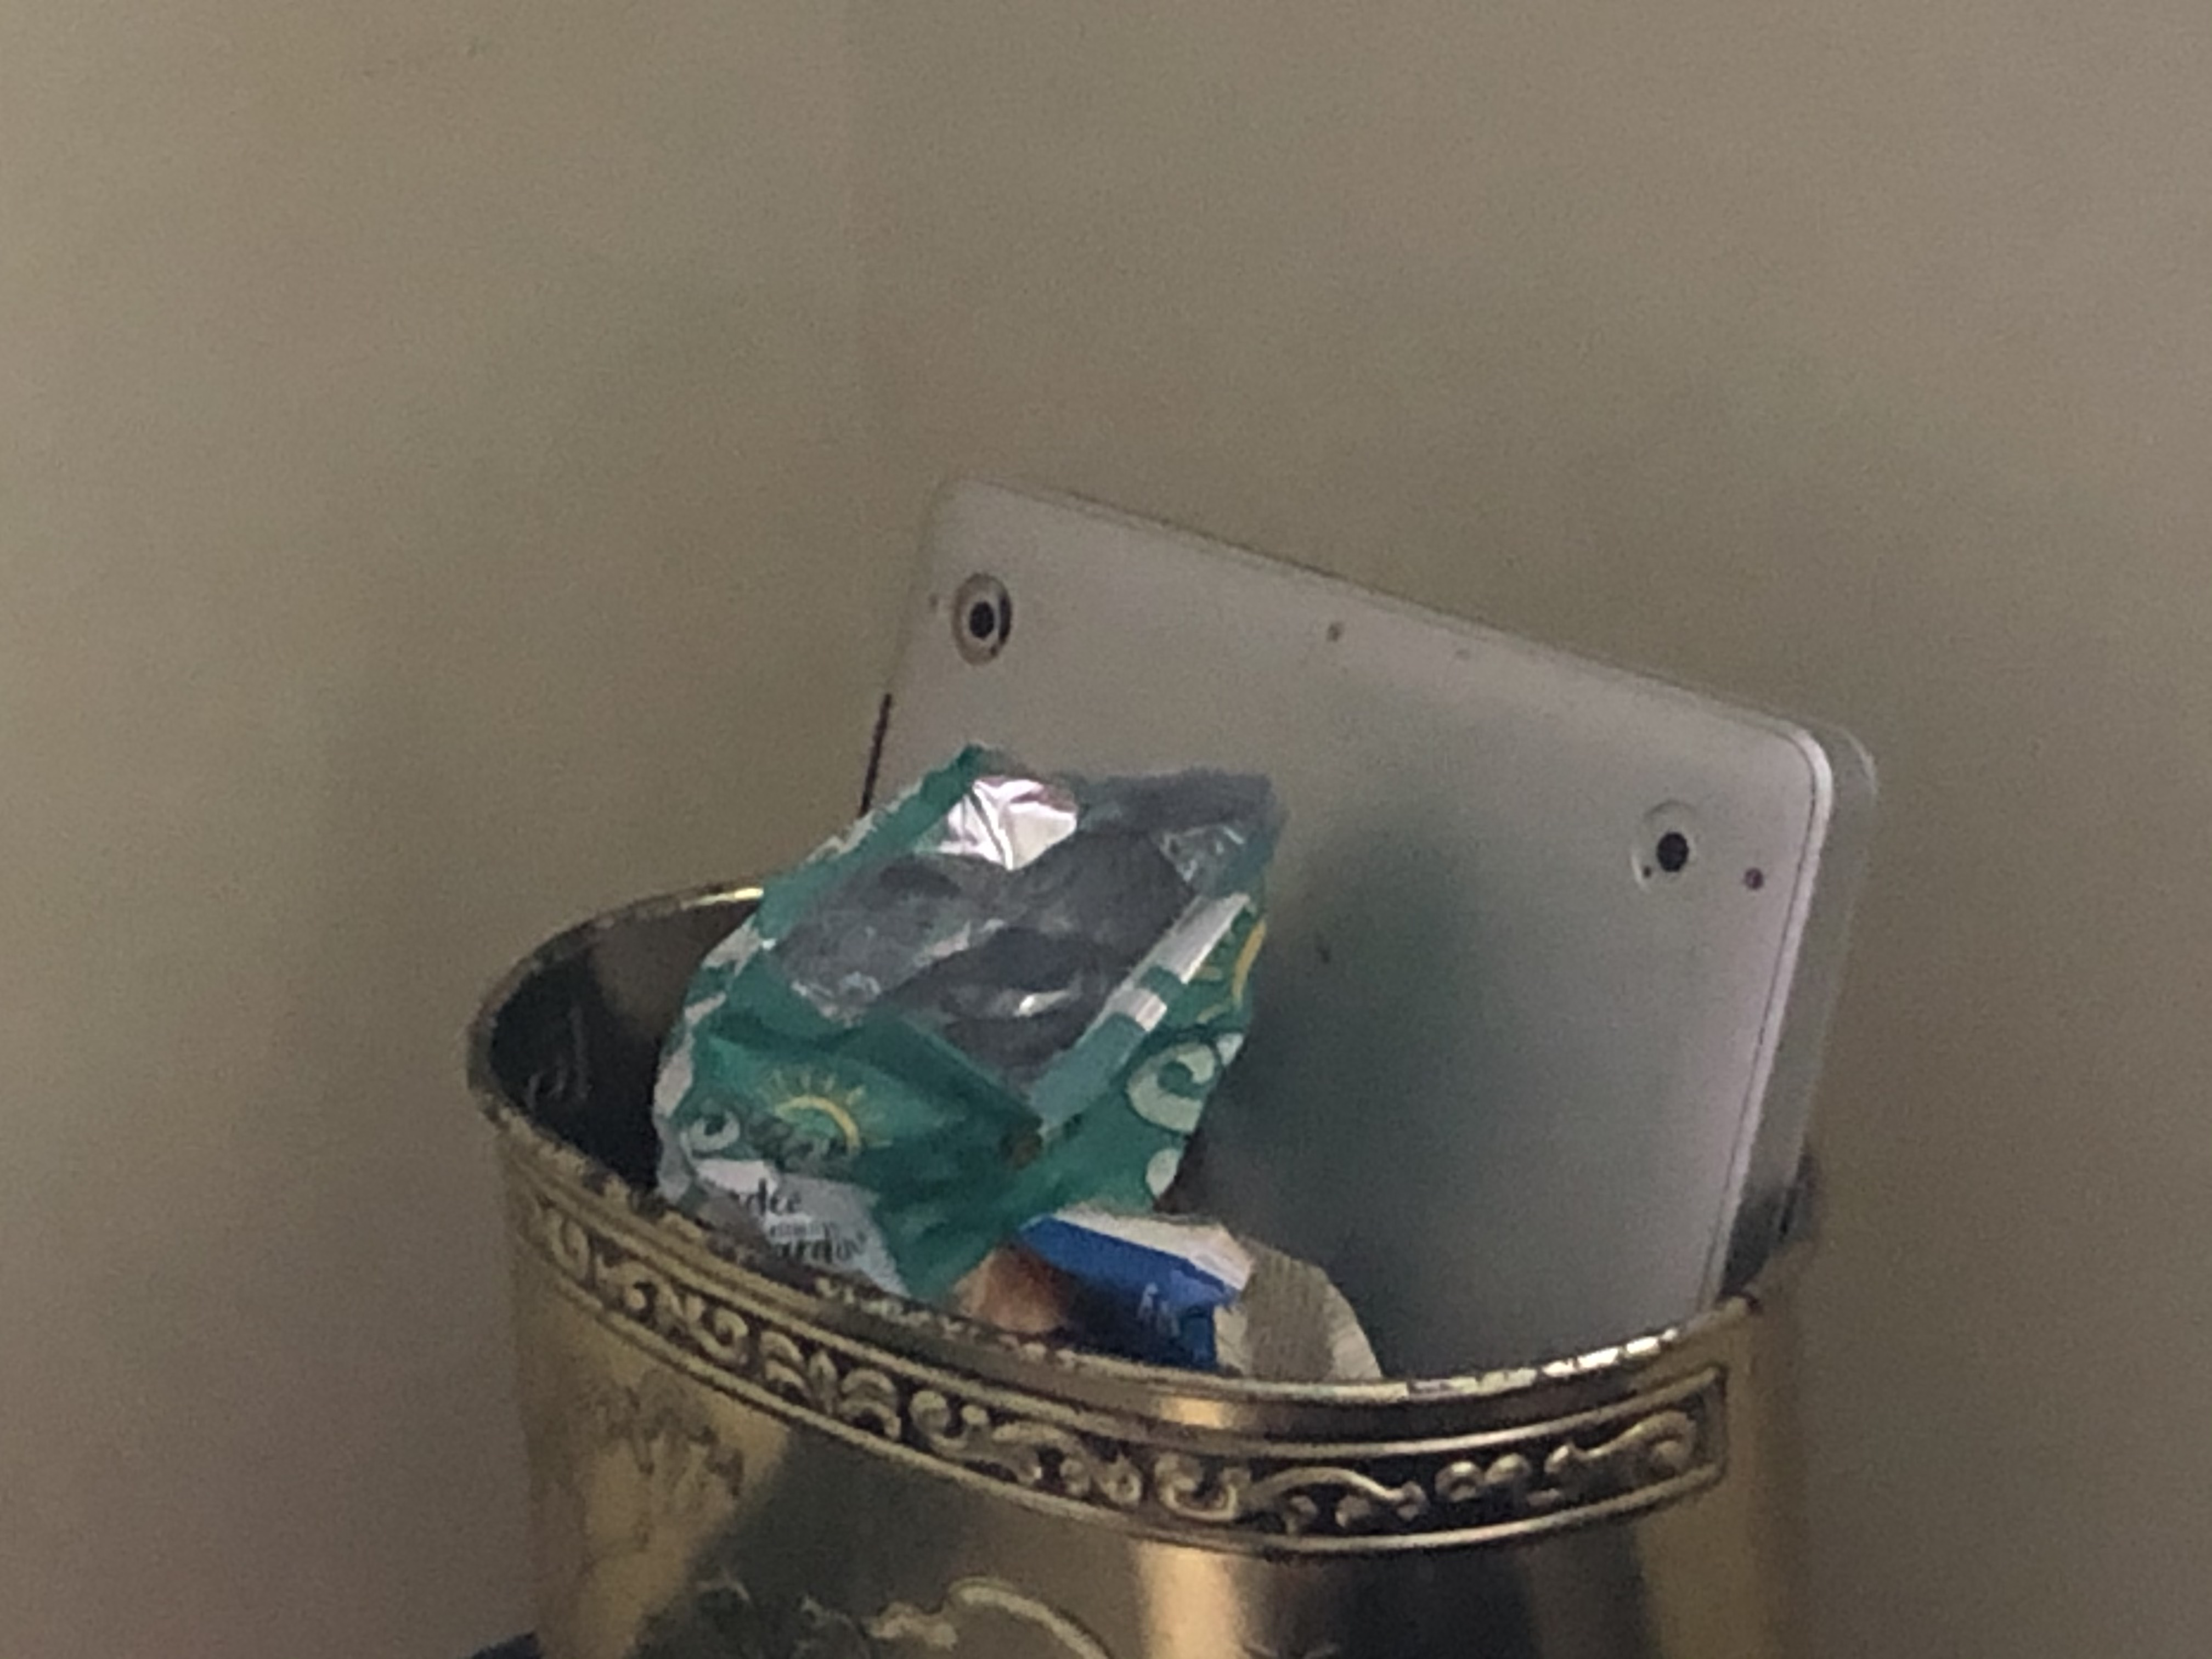 Debri in a trash can